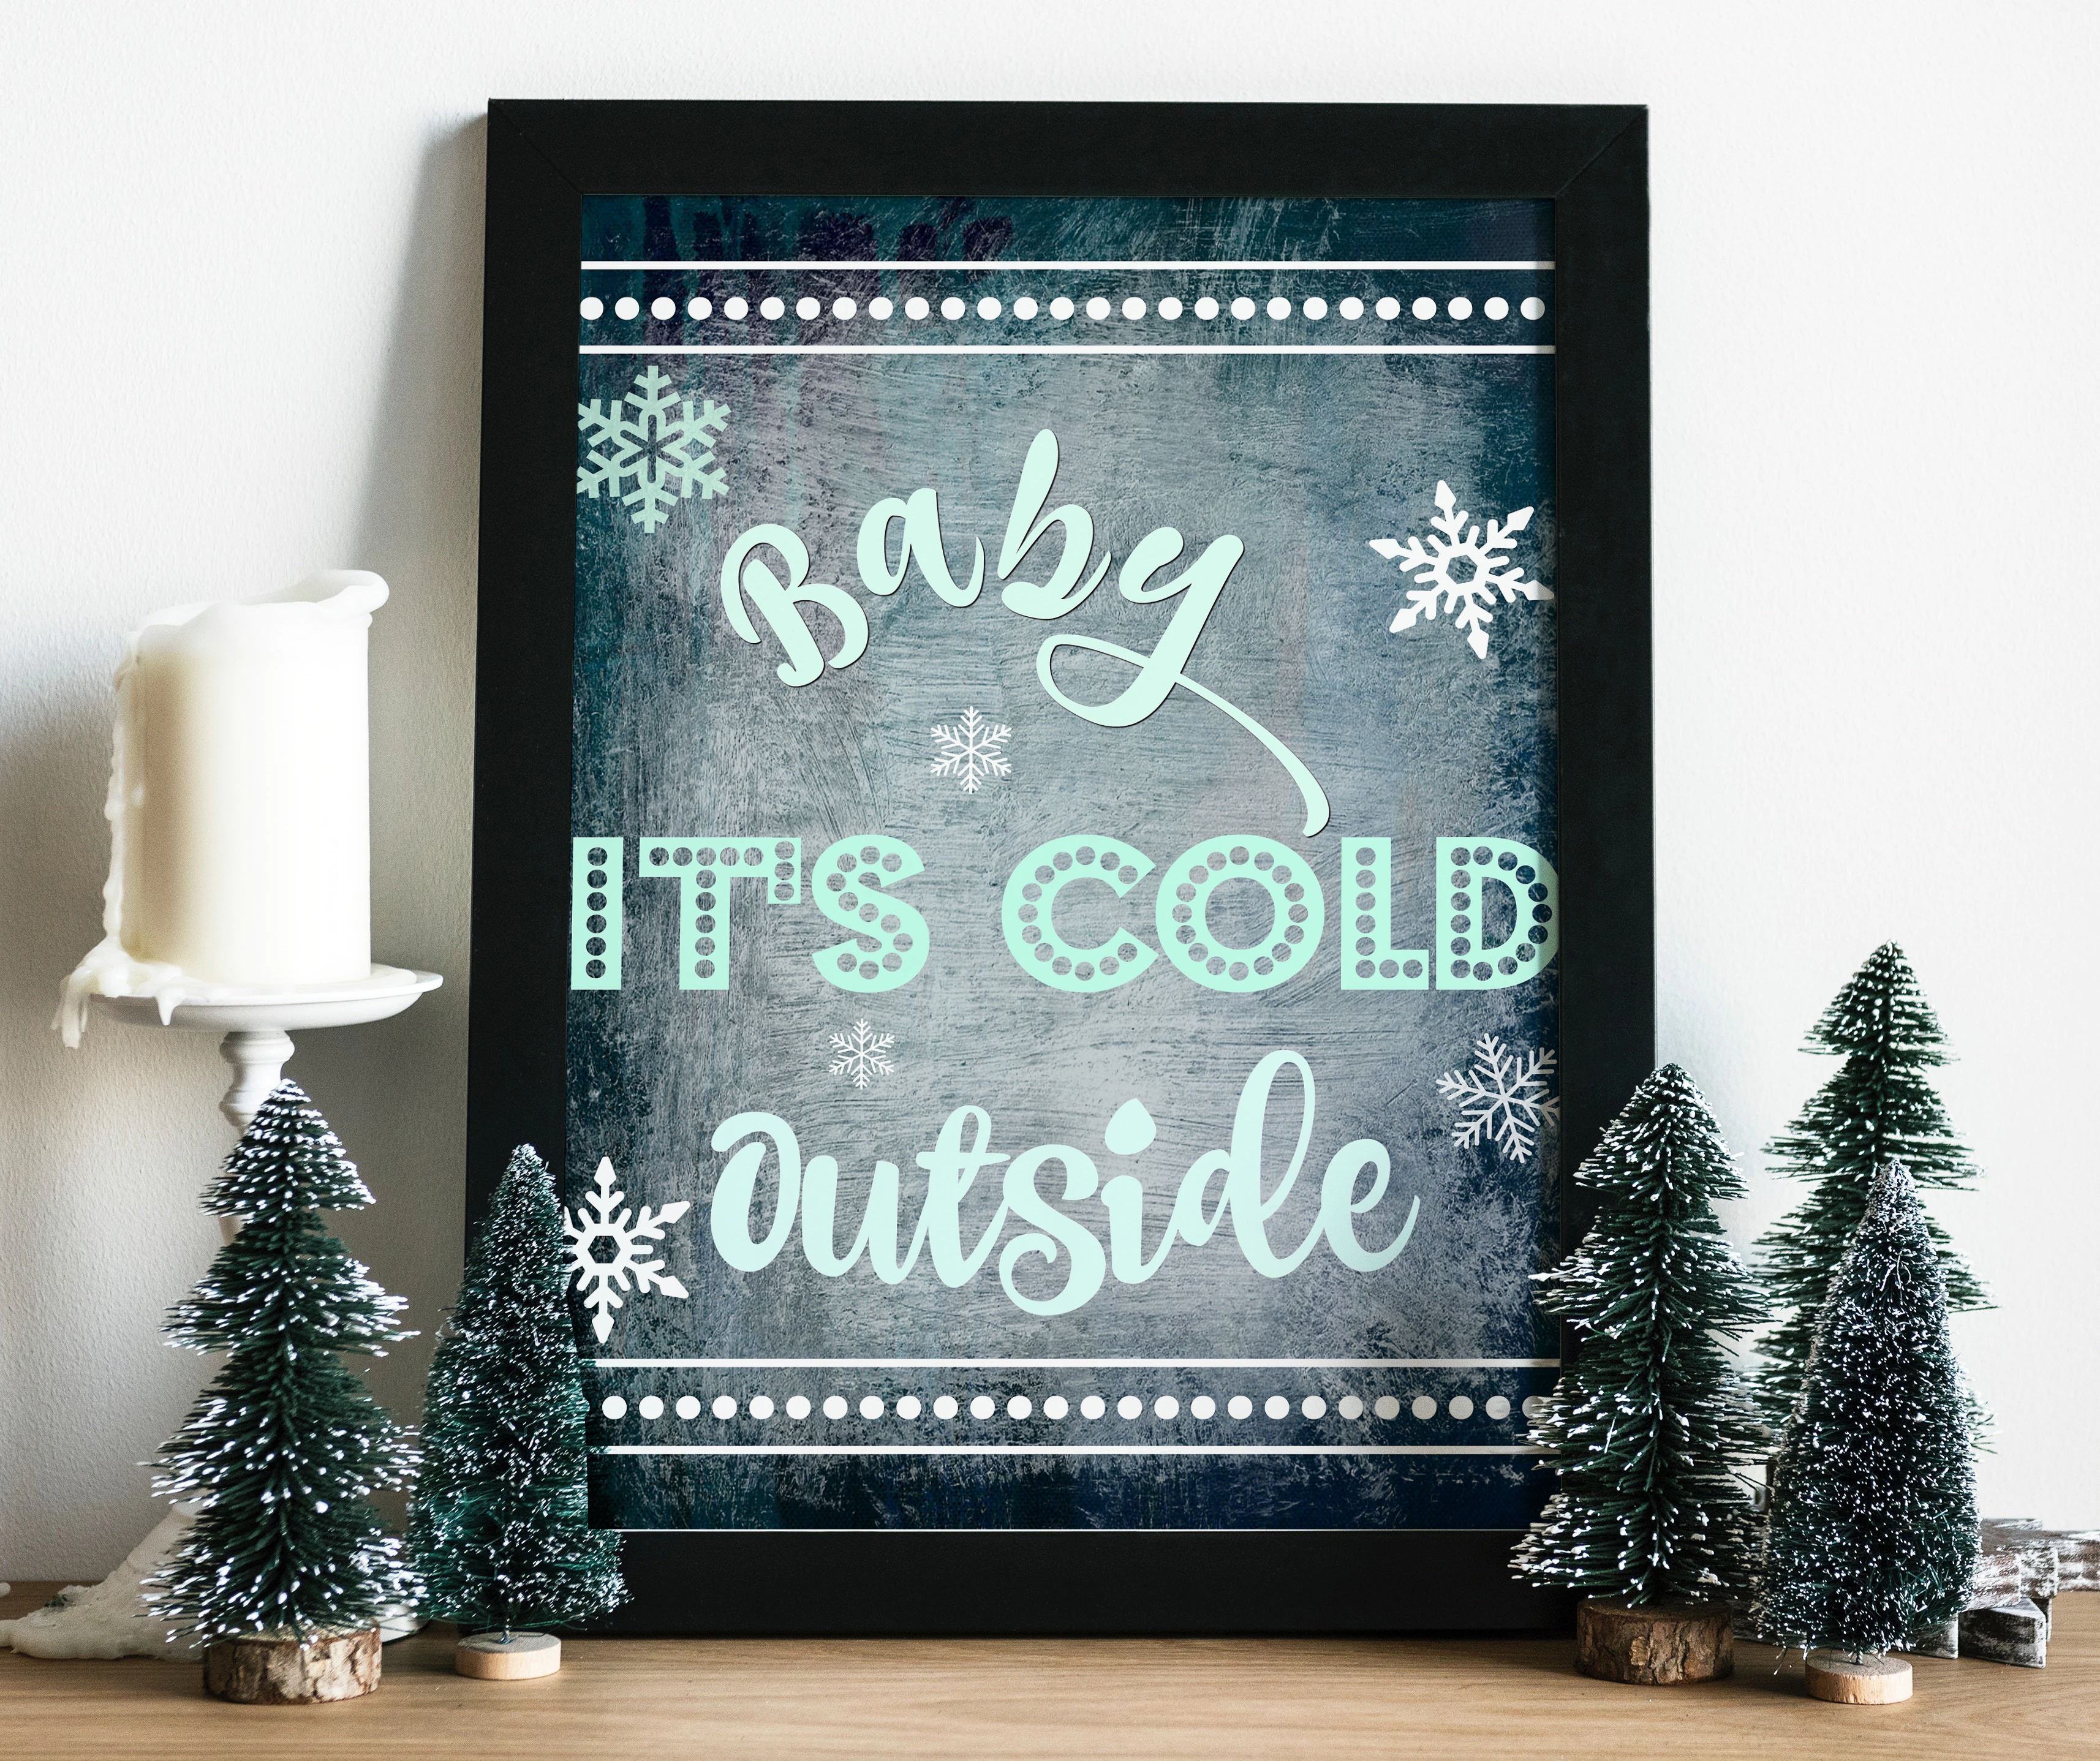 Christmas Gift Ideas 2019 Diy.Baby Its Cold Outside Diy Printable Christmas Decor Ideas Perfect For Diy Christmas Gifts